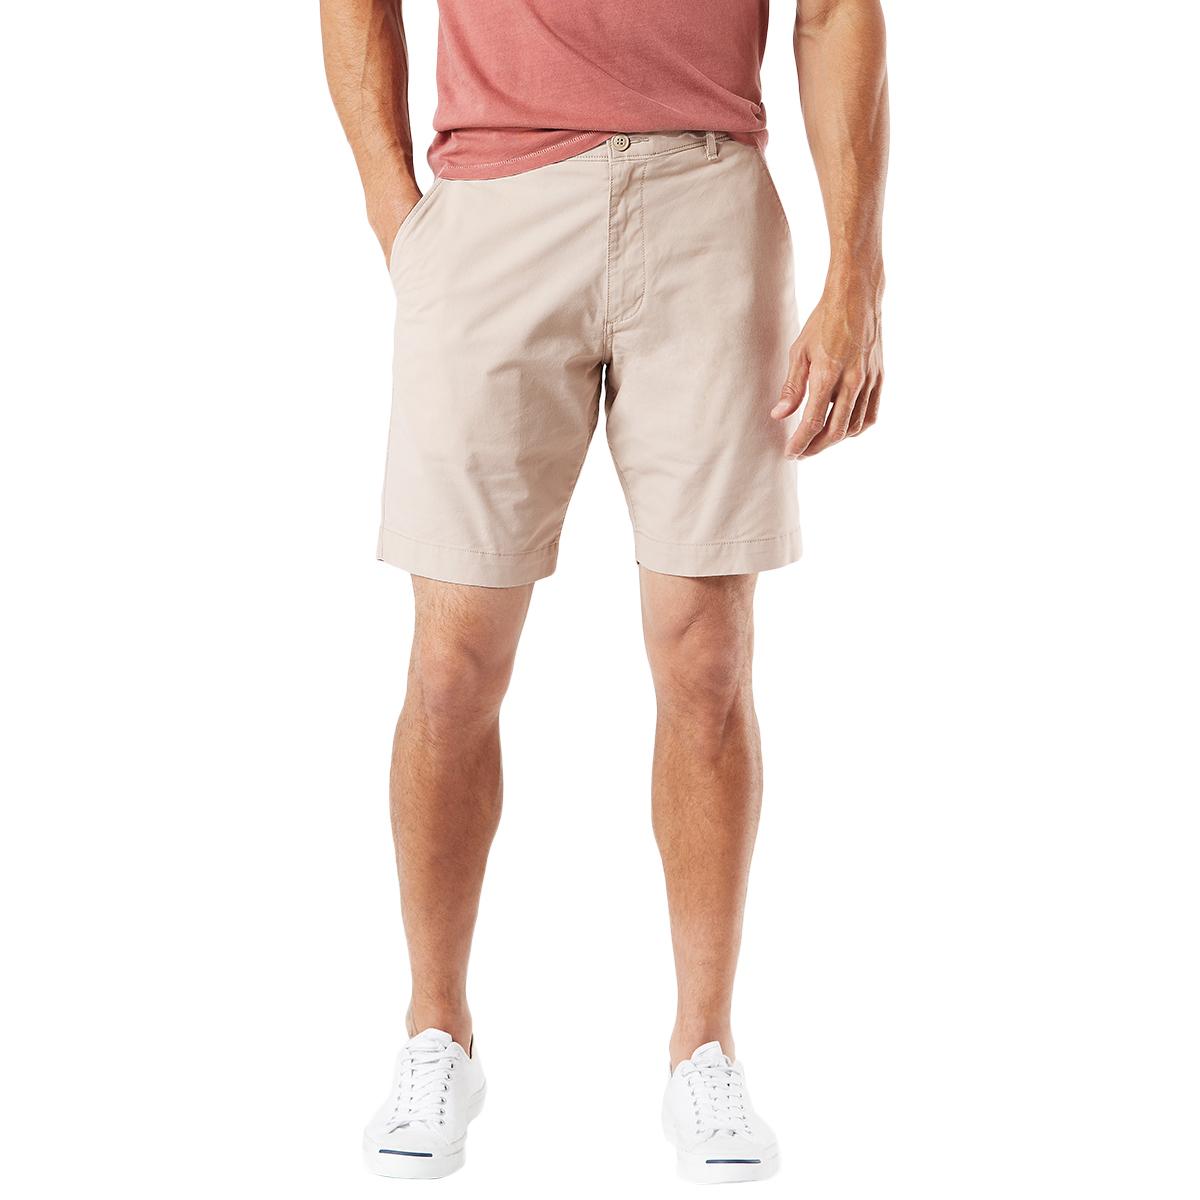 Dockers Men's Duraflex Lite Straight-Fit Shorts - Brown, 42